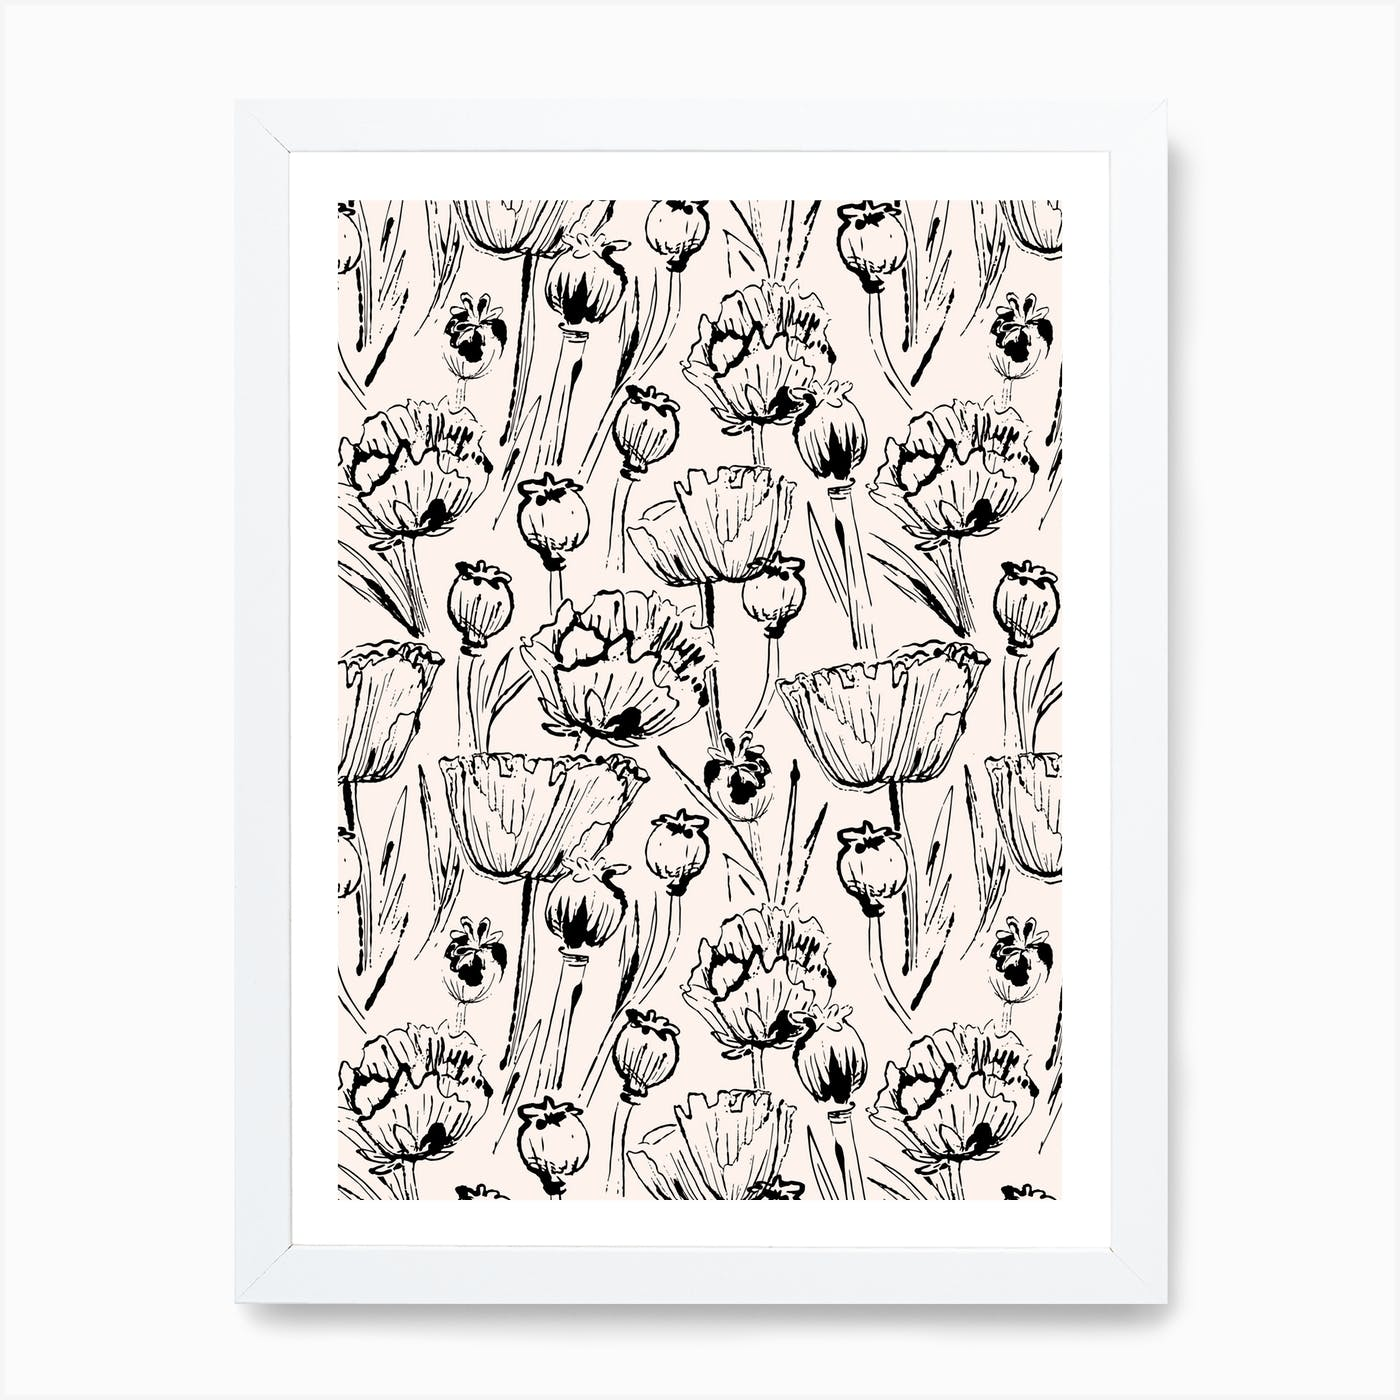 Ryan Gosling Large Poster Art Print Black /& White Canvas or Card